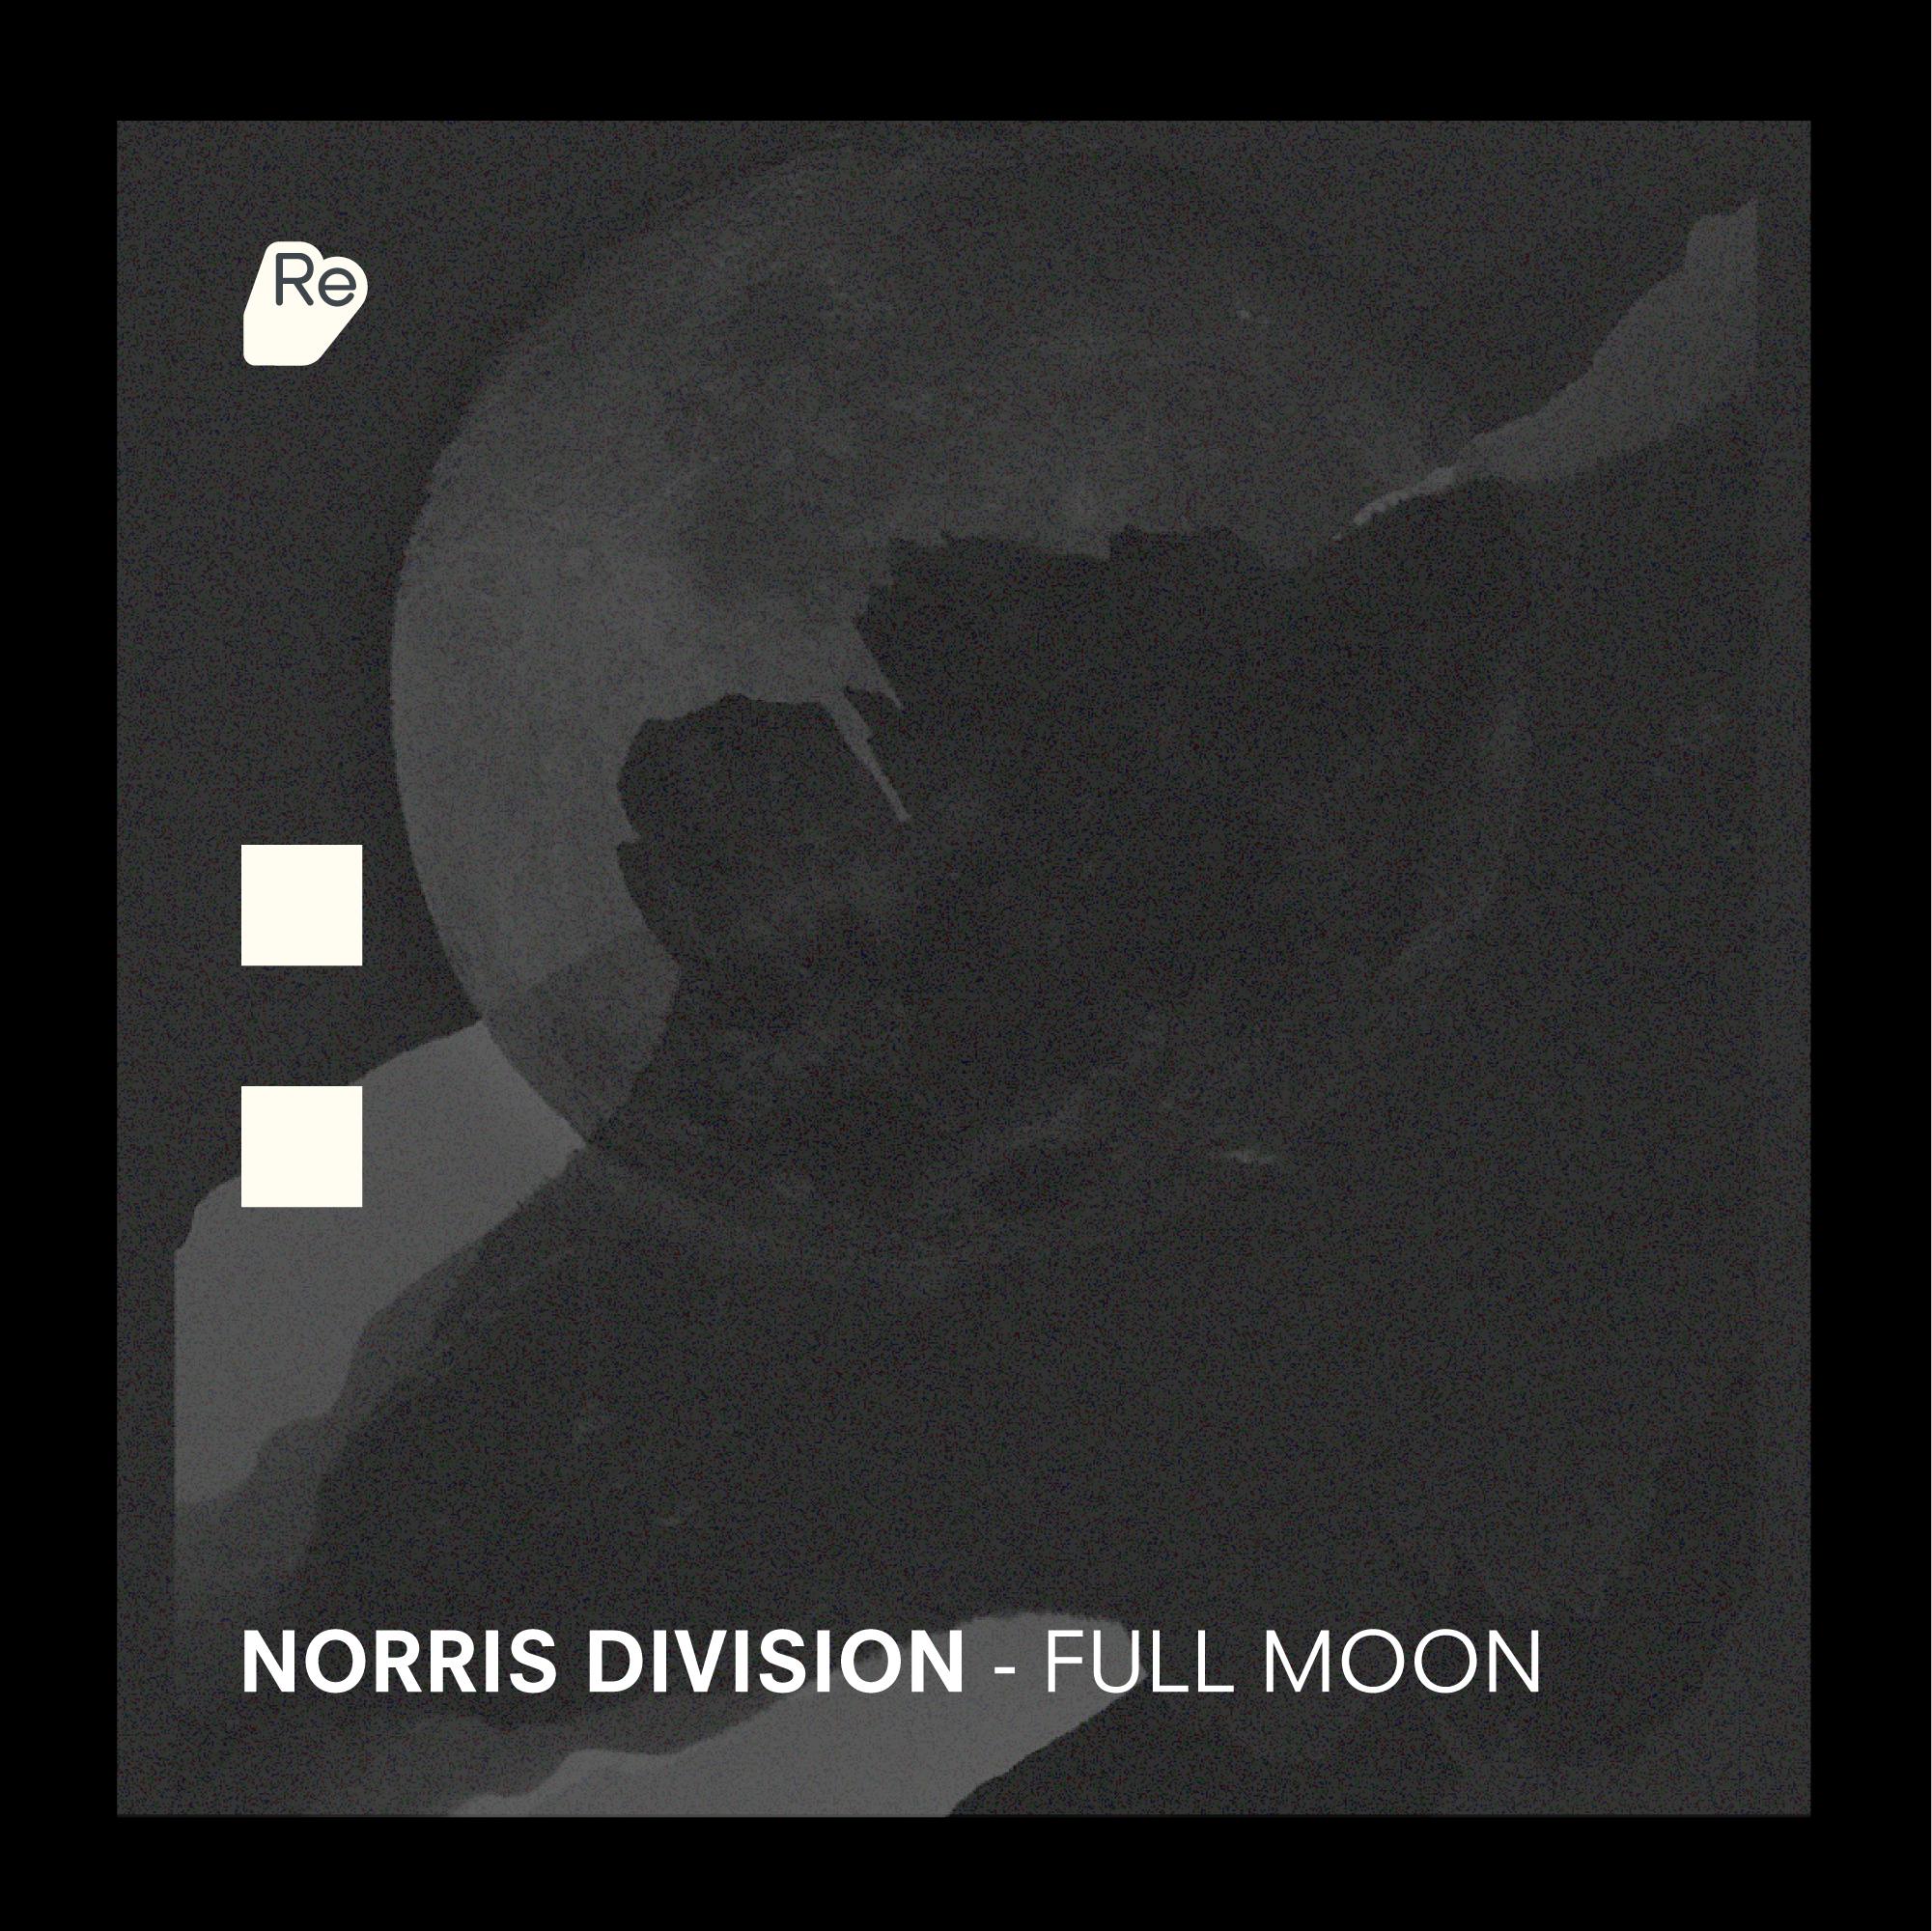 noris_division_-_full_moon.jpg